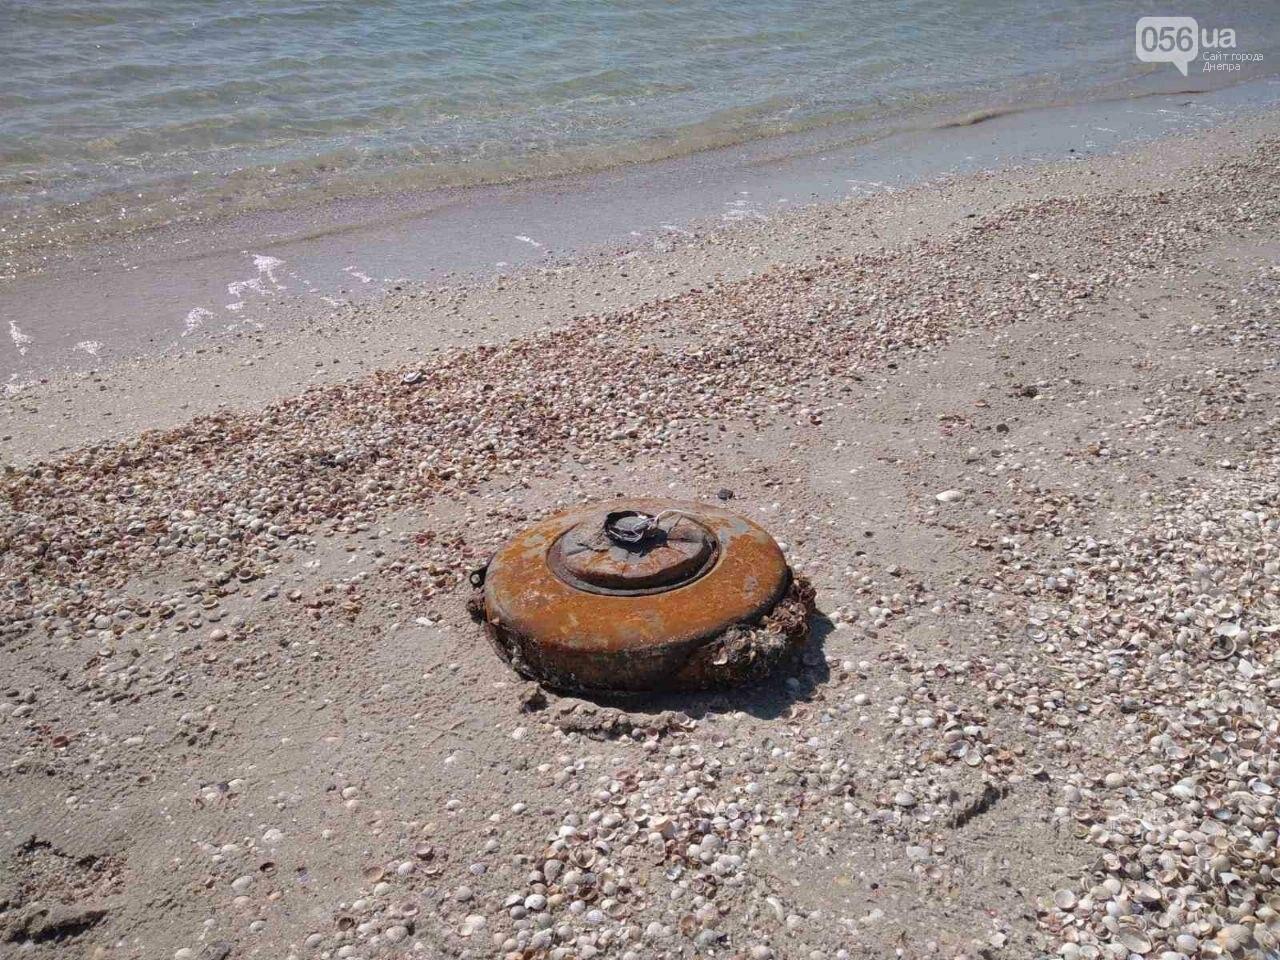 На море, куда ездят большинство днепрян, нашли жуткие находки, - ФОТО 18+, фото-4